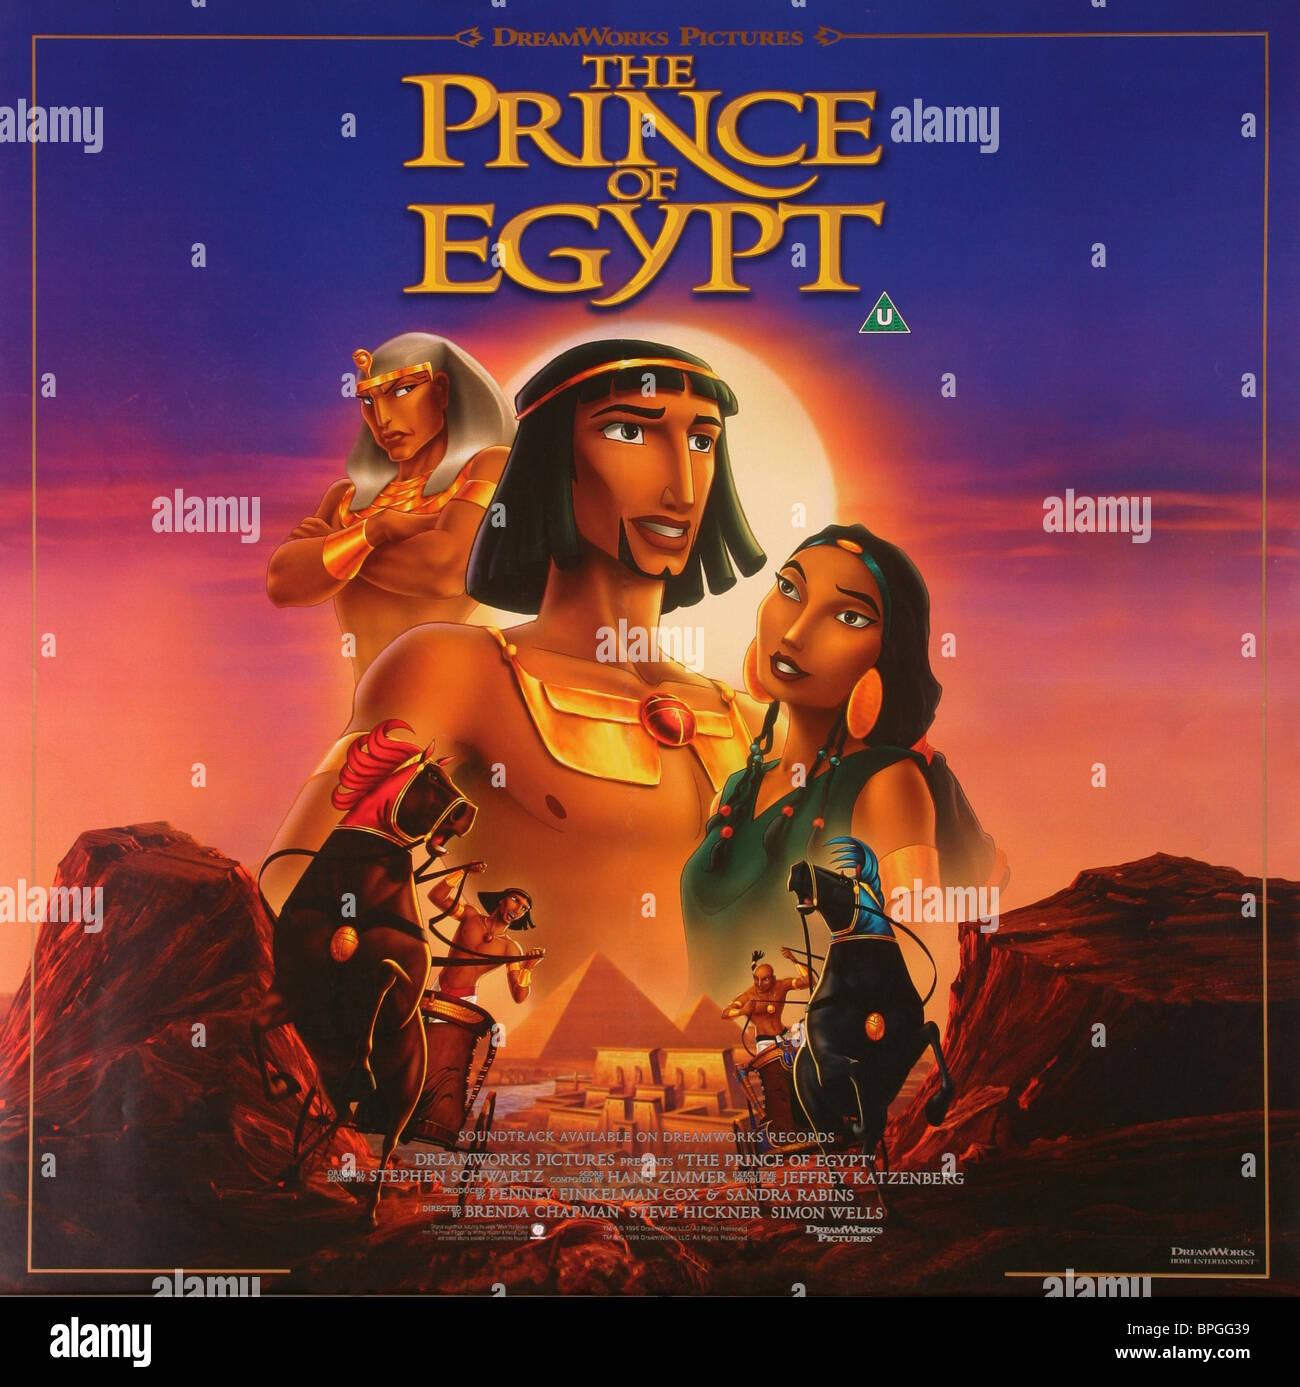 The Prince Of Egypt Film Stock Photos & The Prince Of Egypt Film